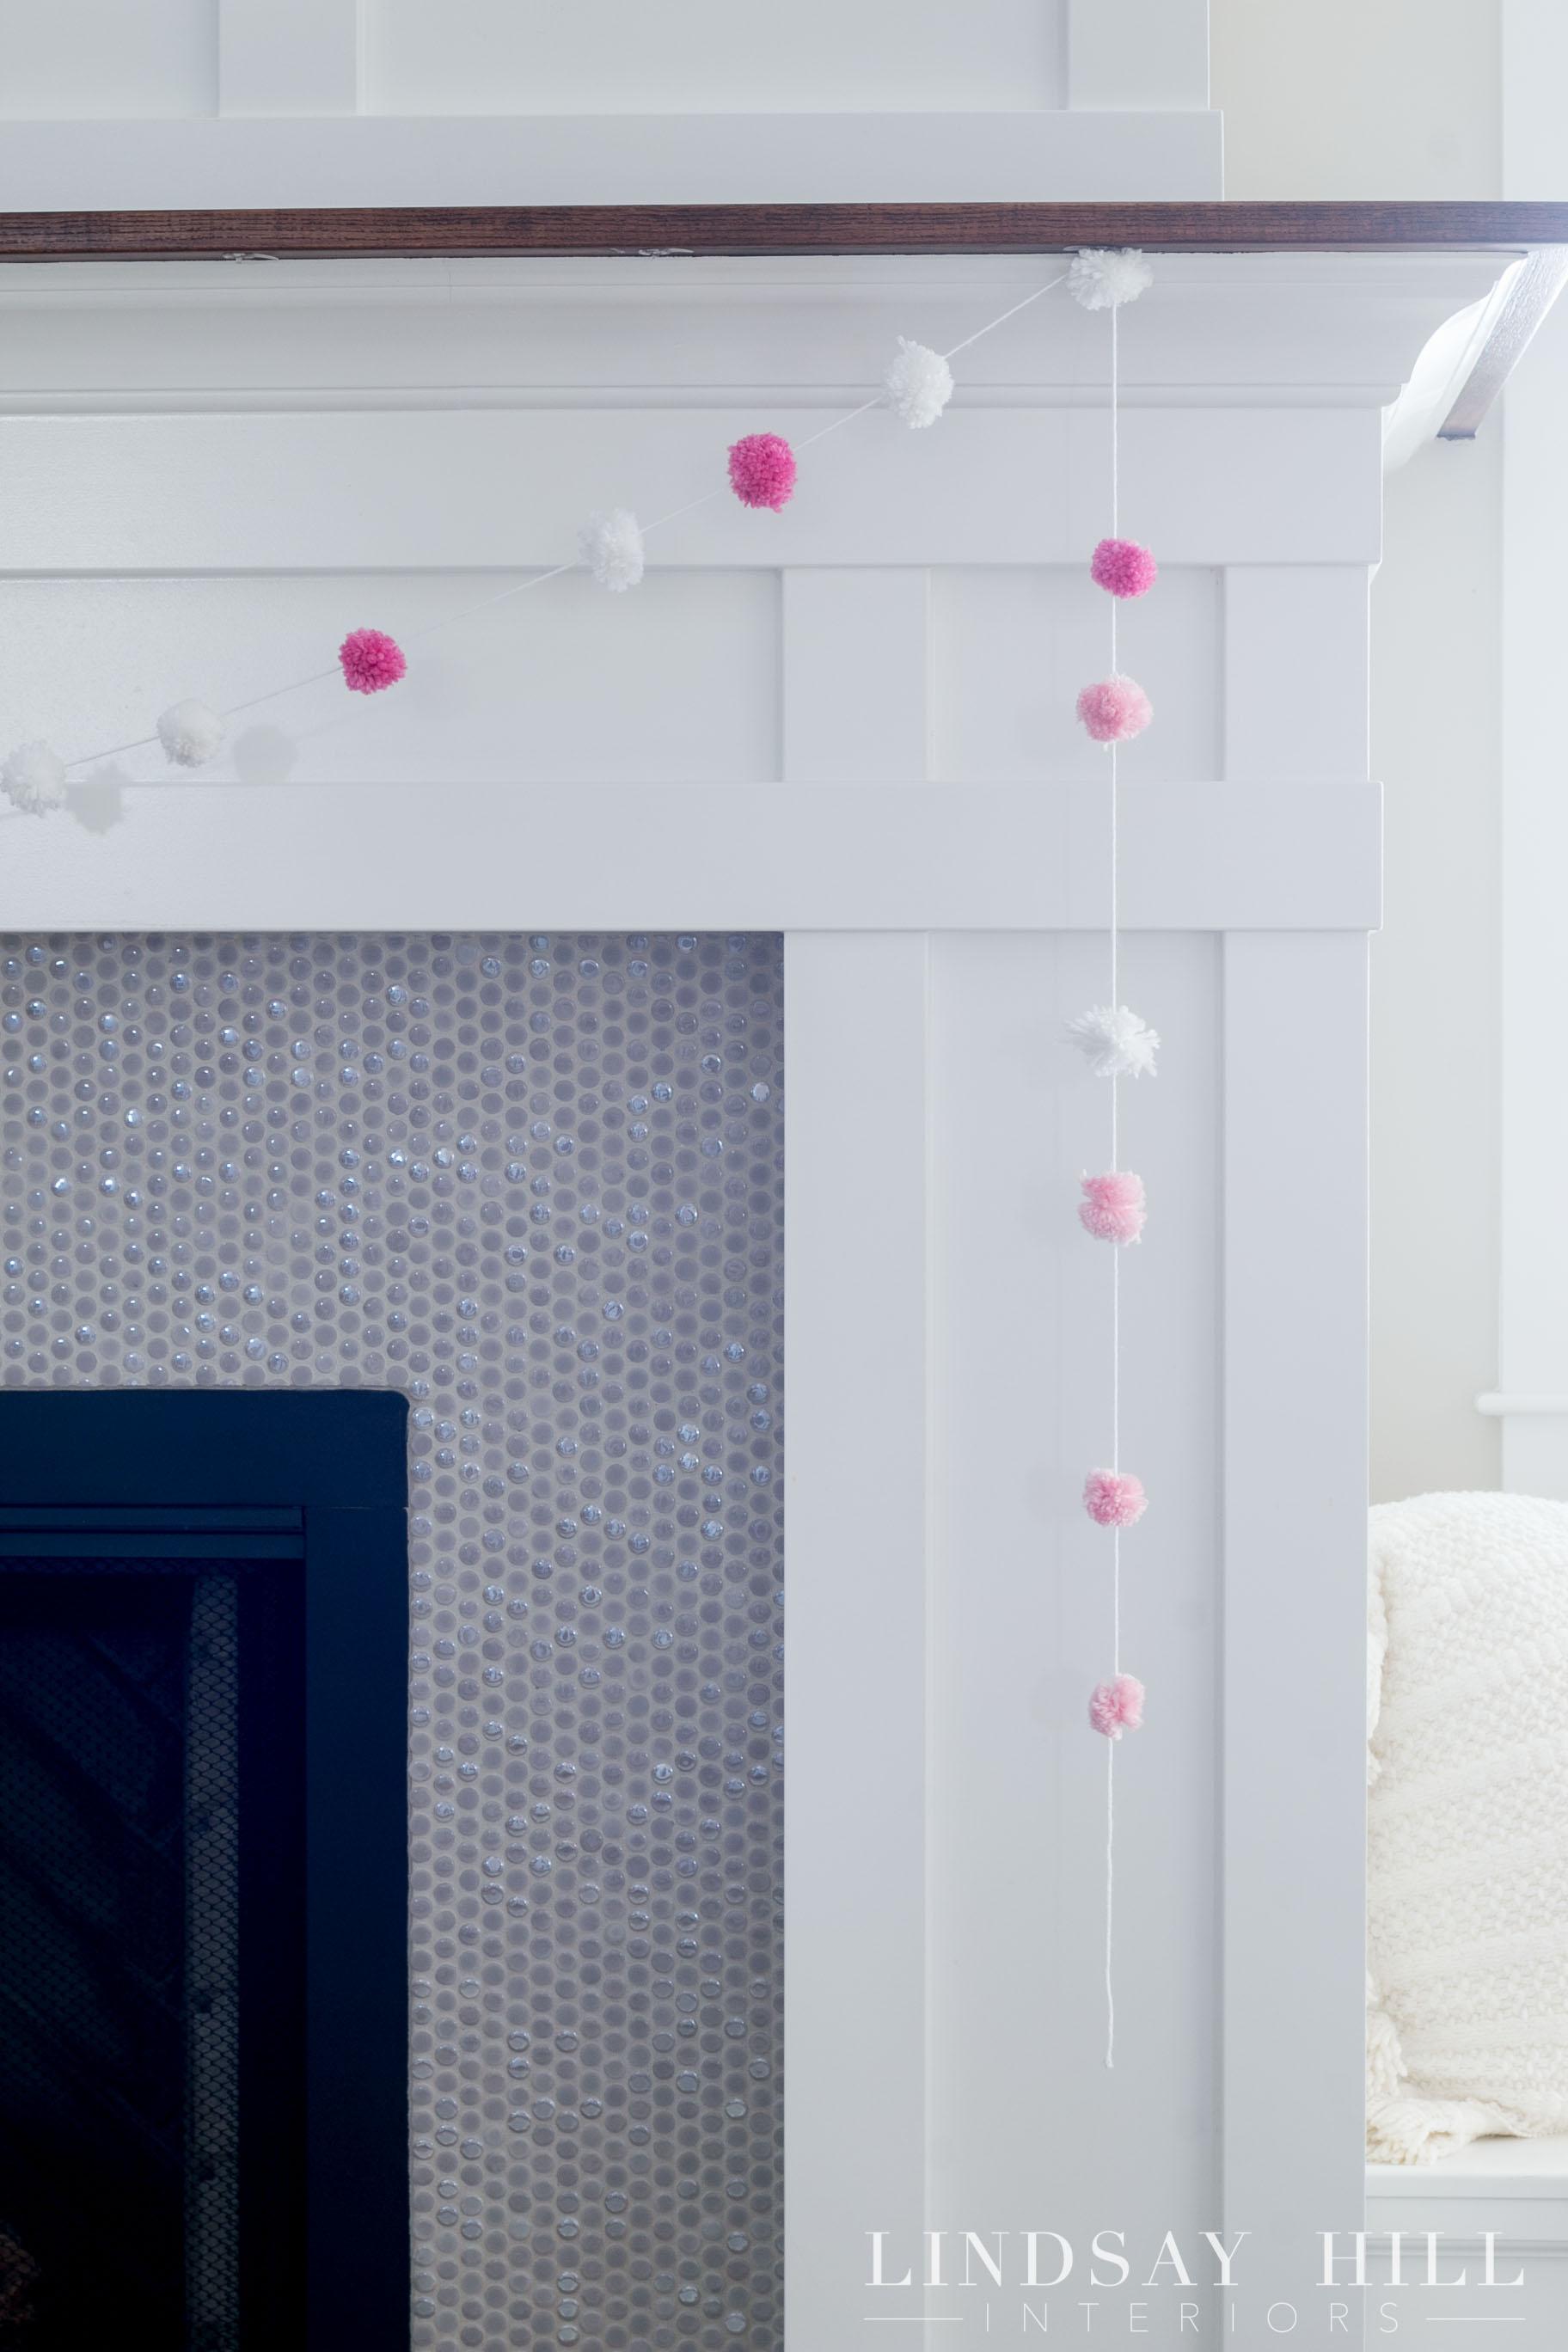 lindsay hill interiors simple valentine's day decor pom pom garland